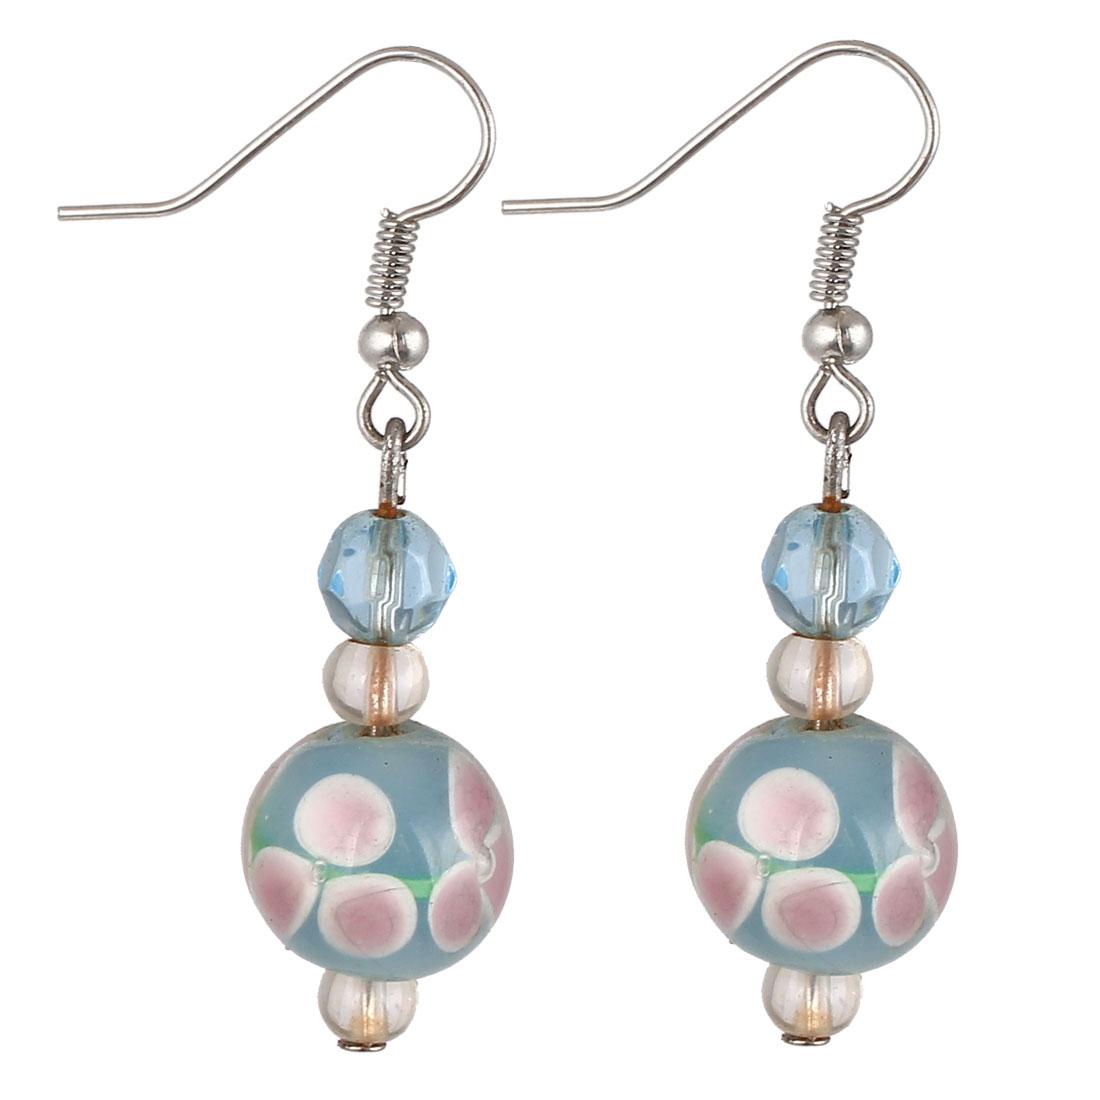 Lady Plastic Clover Pattern Inner Beaded Dangling Pendant Hook Earrings Blue Pair